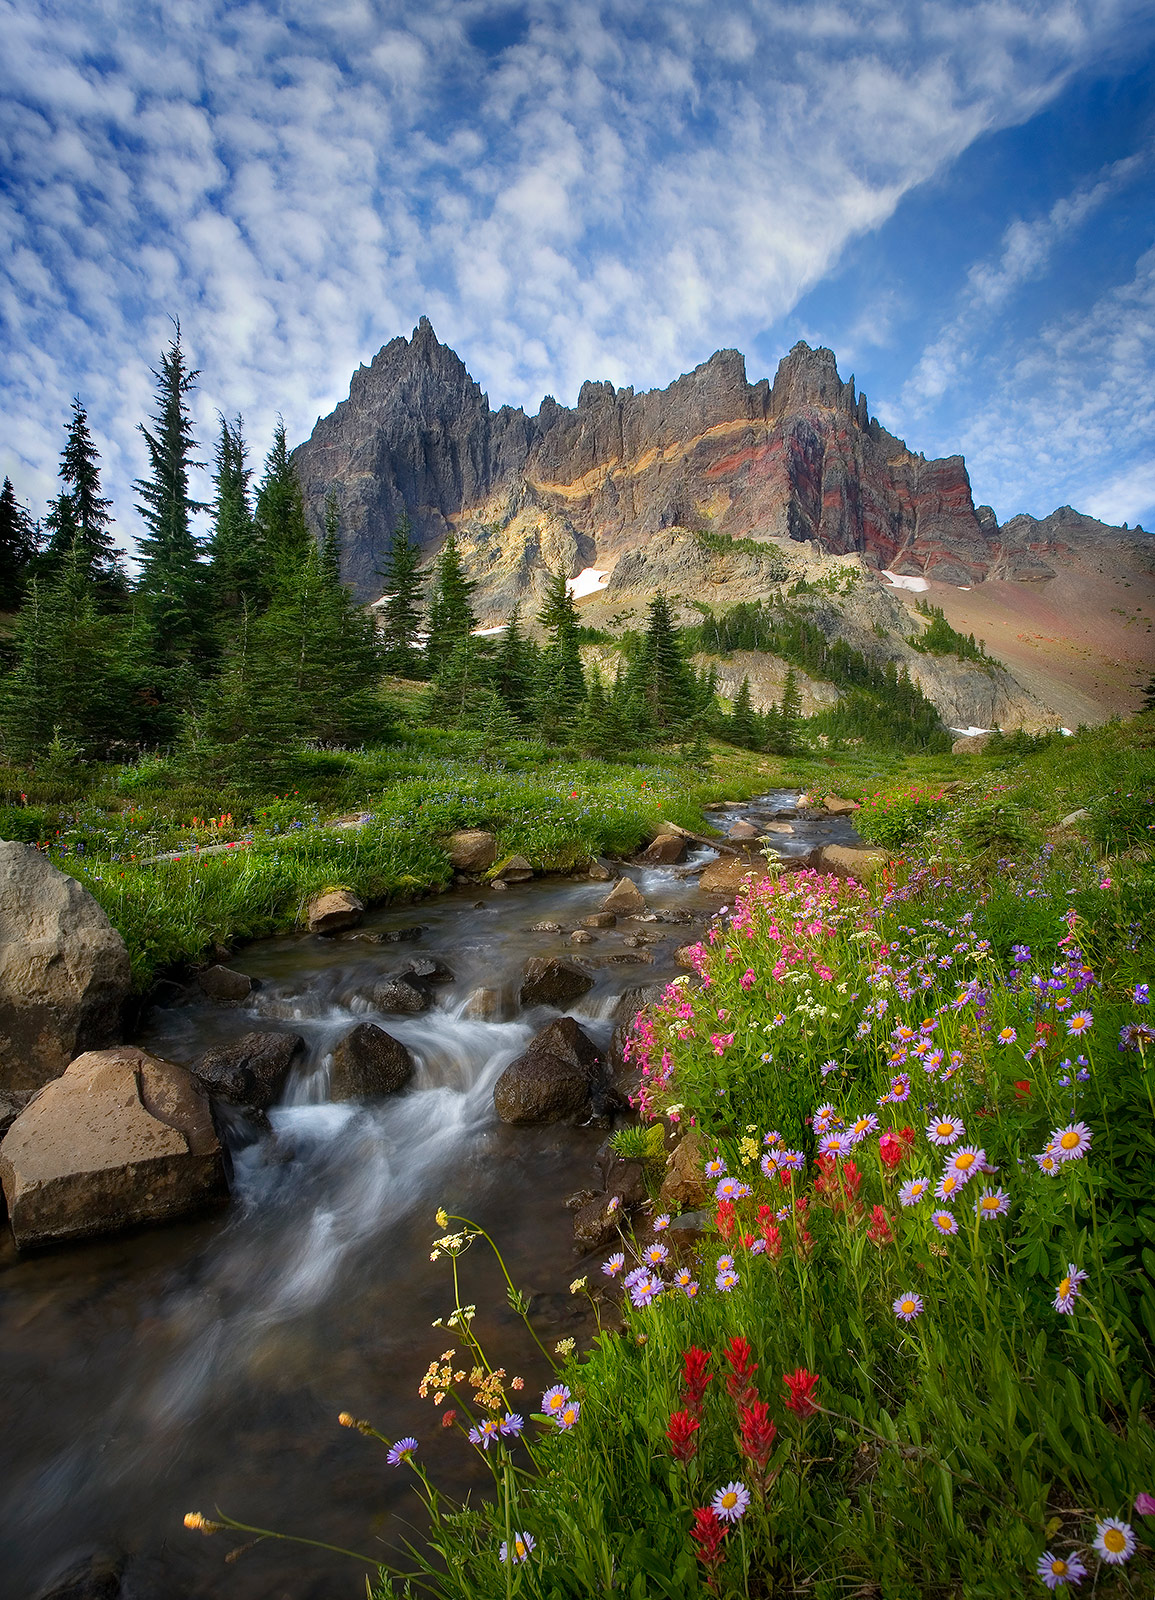 Three Fingered Jack, peak, clouds, stream, wildflowers, mountain, photo